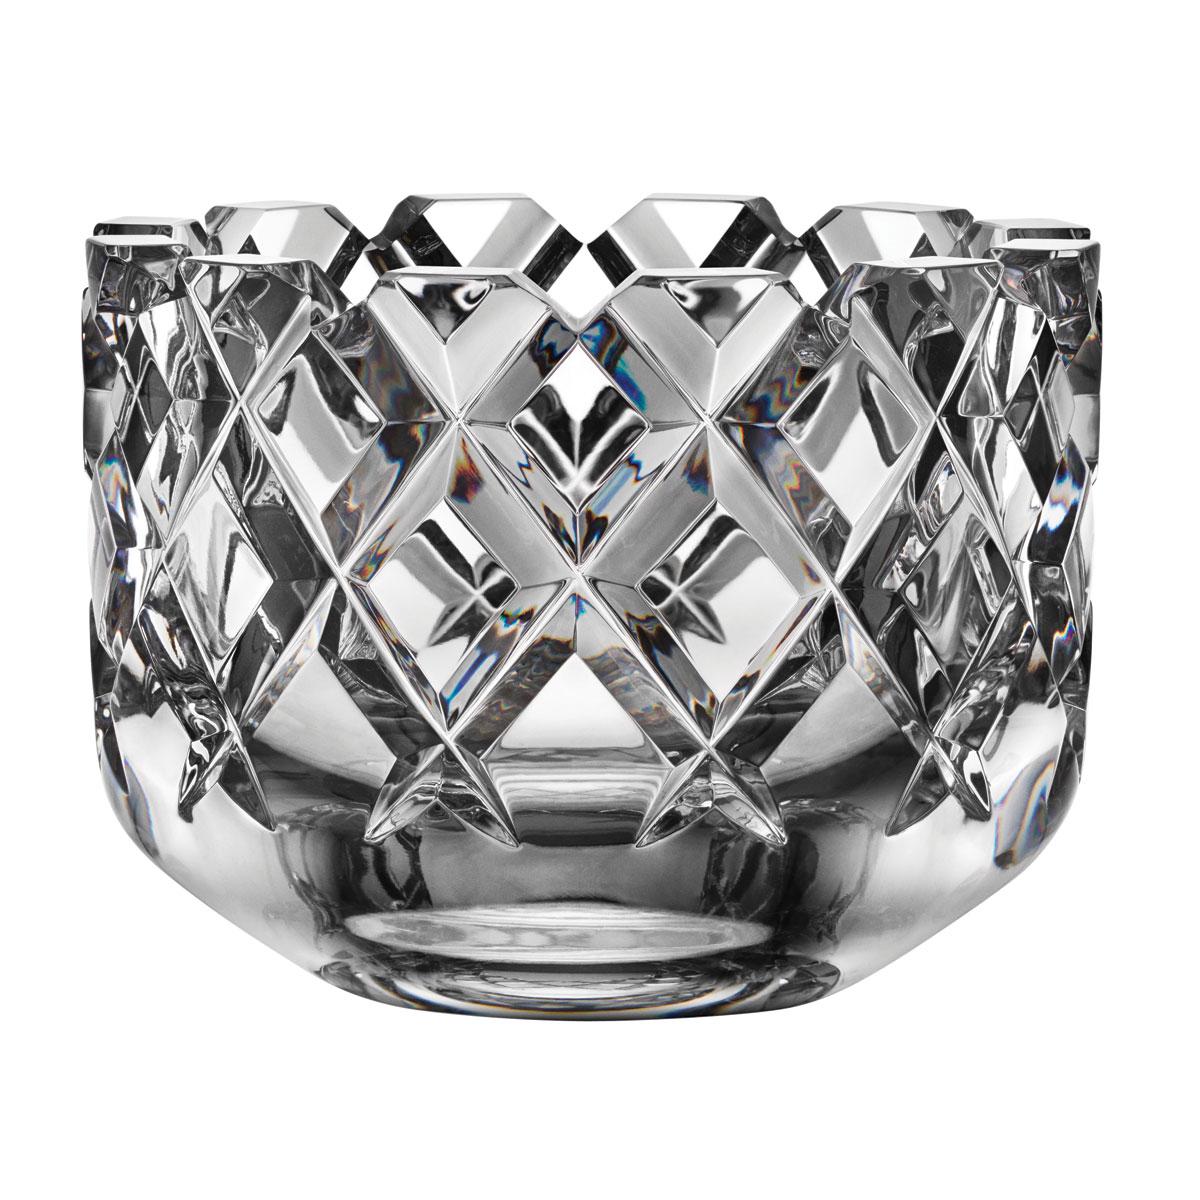 Orrefors Crystal, Classic Sofiero Medium Crystal Bowl